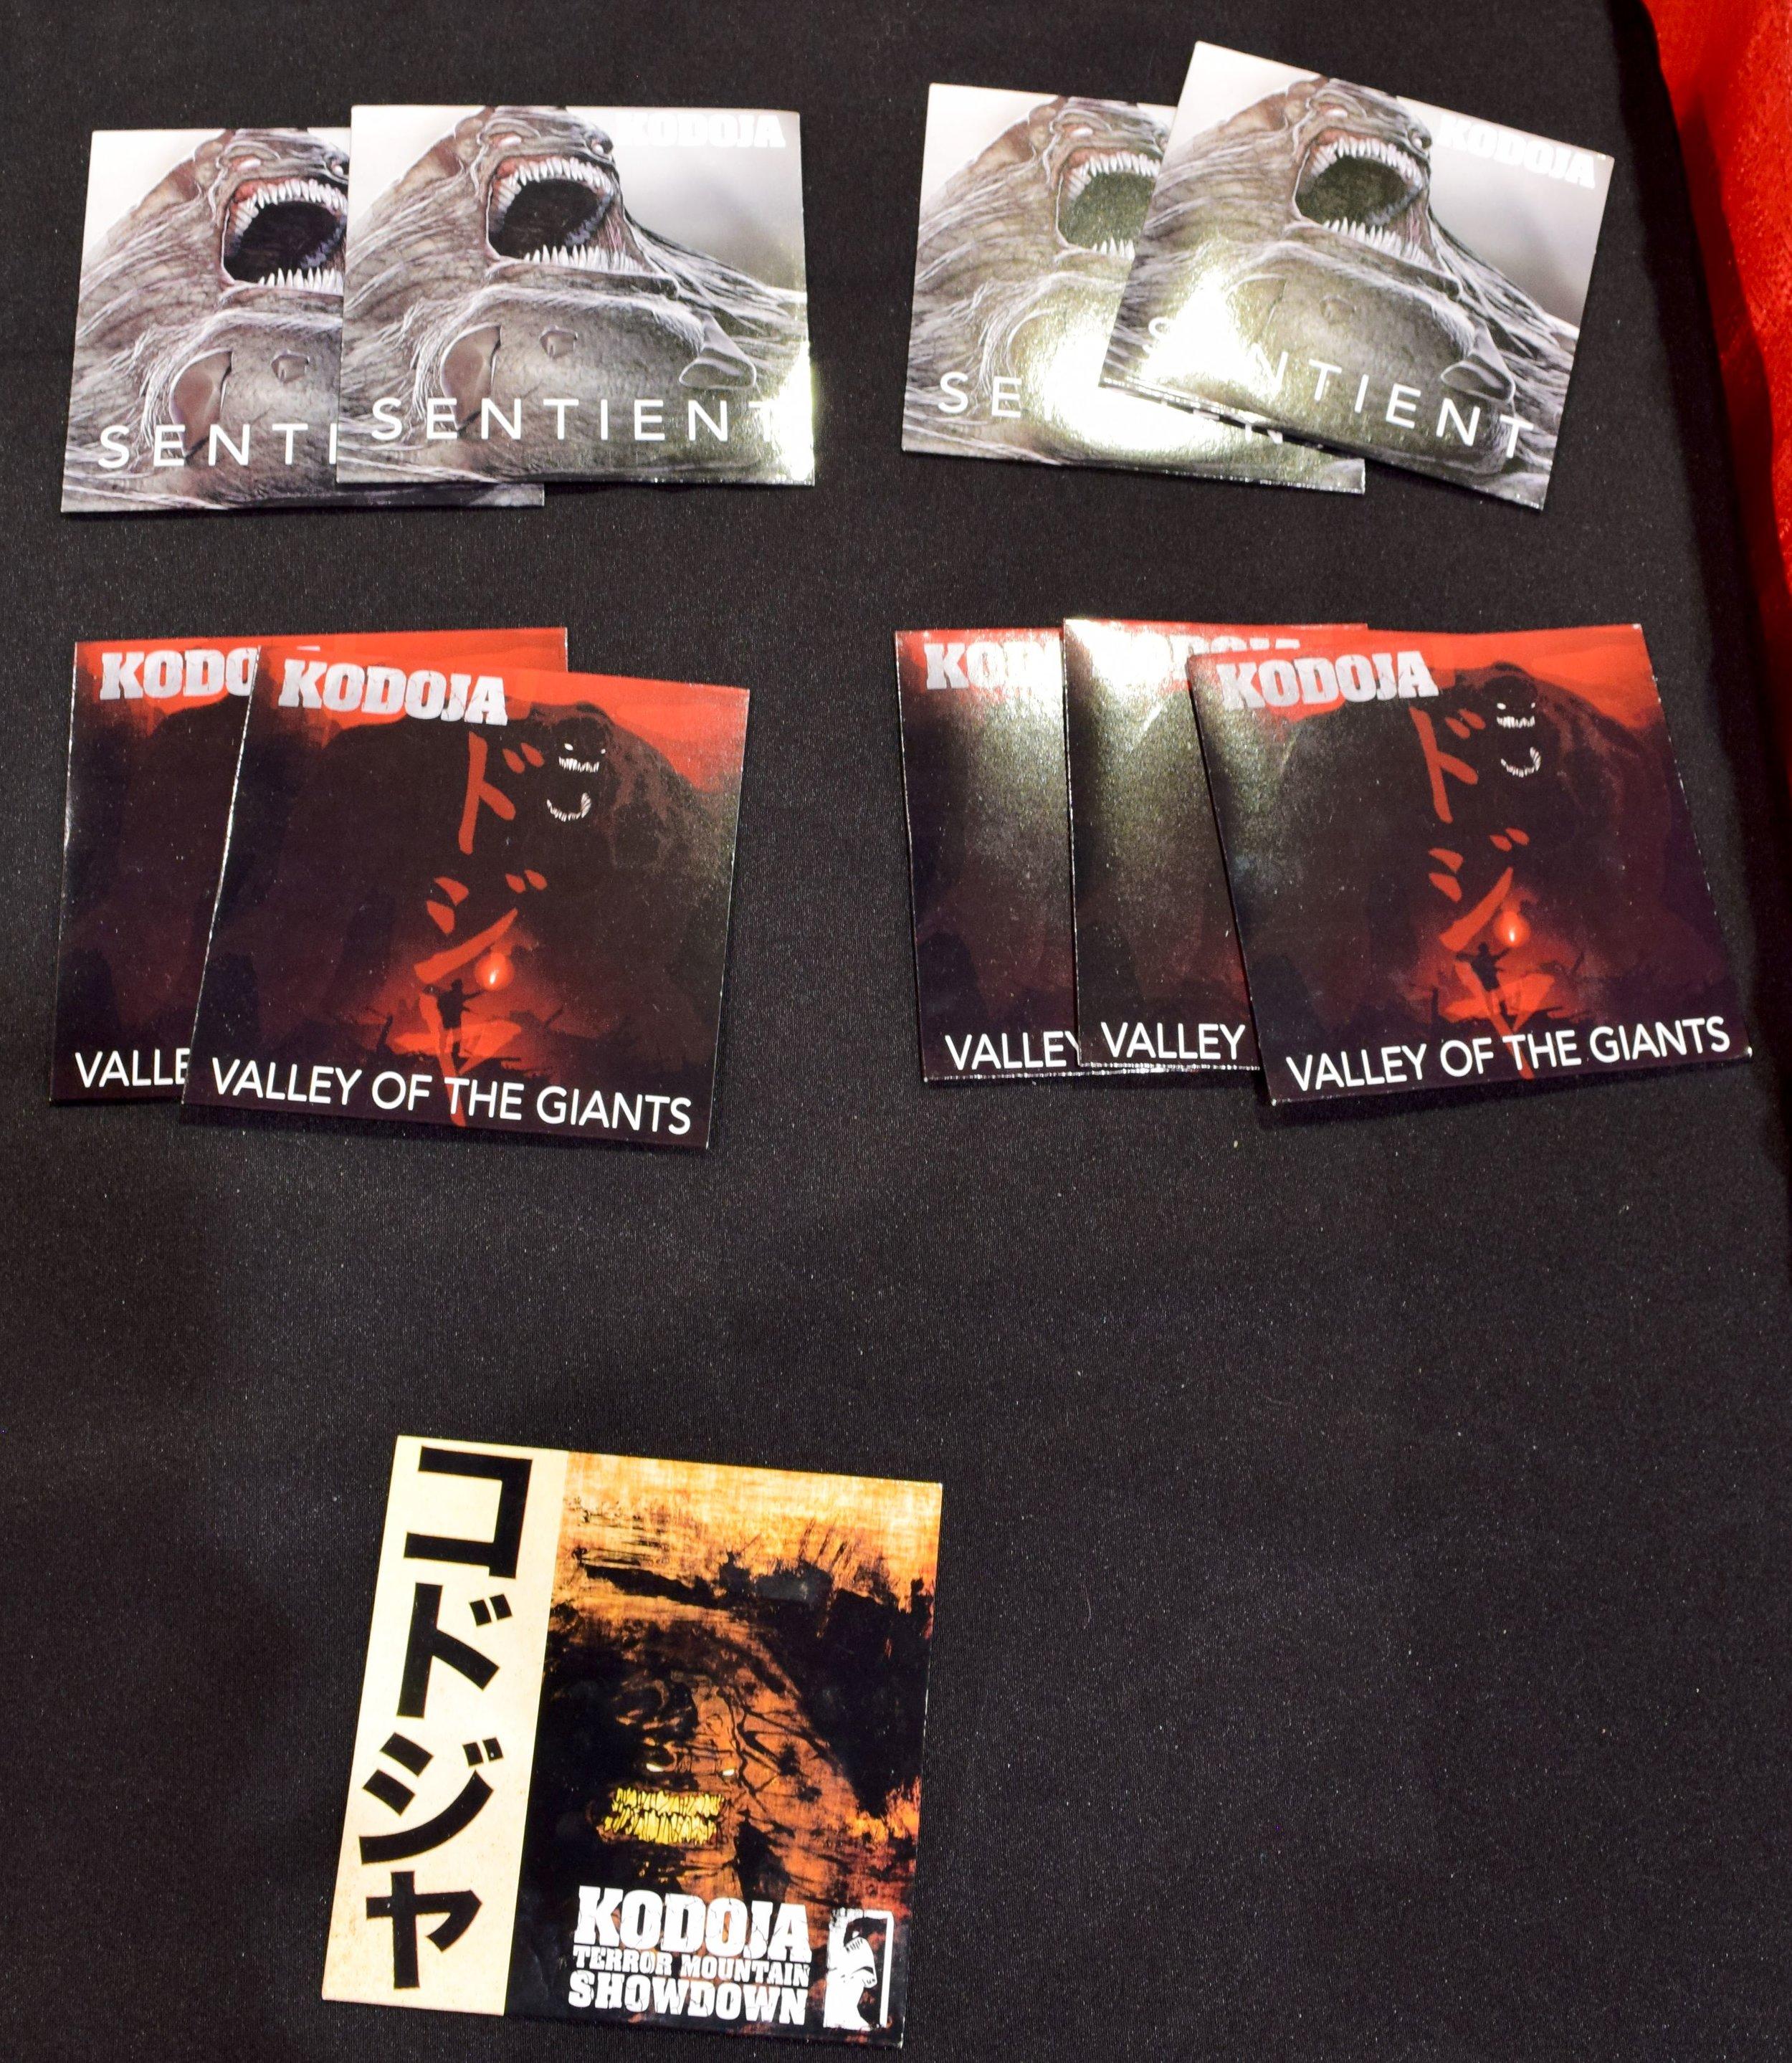 Kodoja CDs at Phoenix Comic Con 2017.